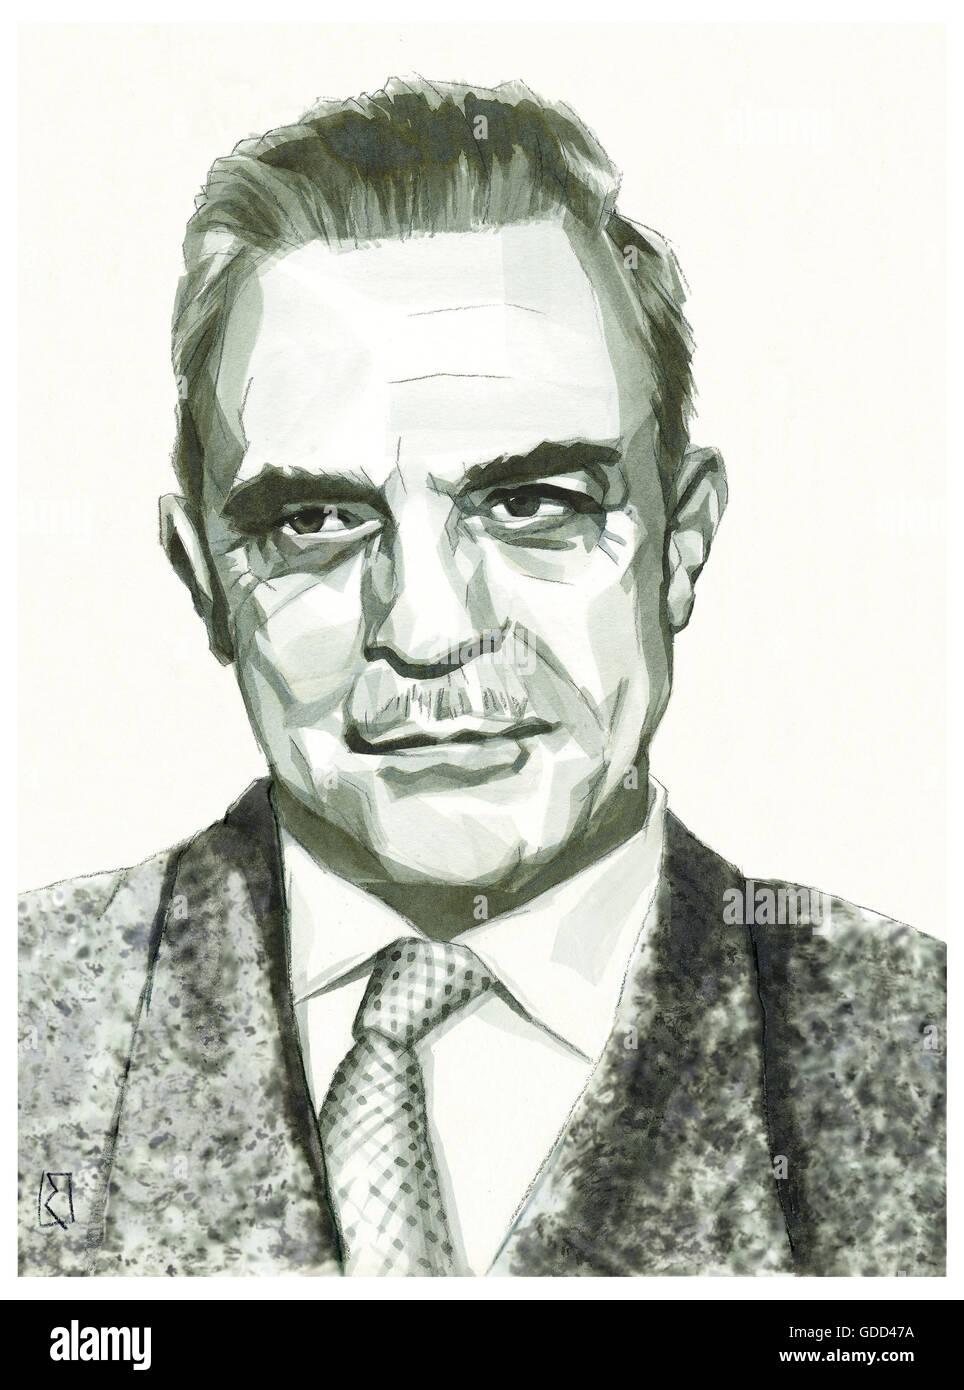 Erickson, Milton H., 5.12.1901 - 25.3.1980, American medic / physician (psychiatrist), portrait, monochrome drawing Stock Photo